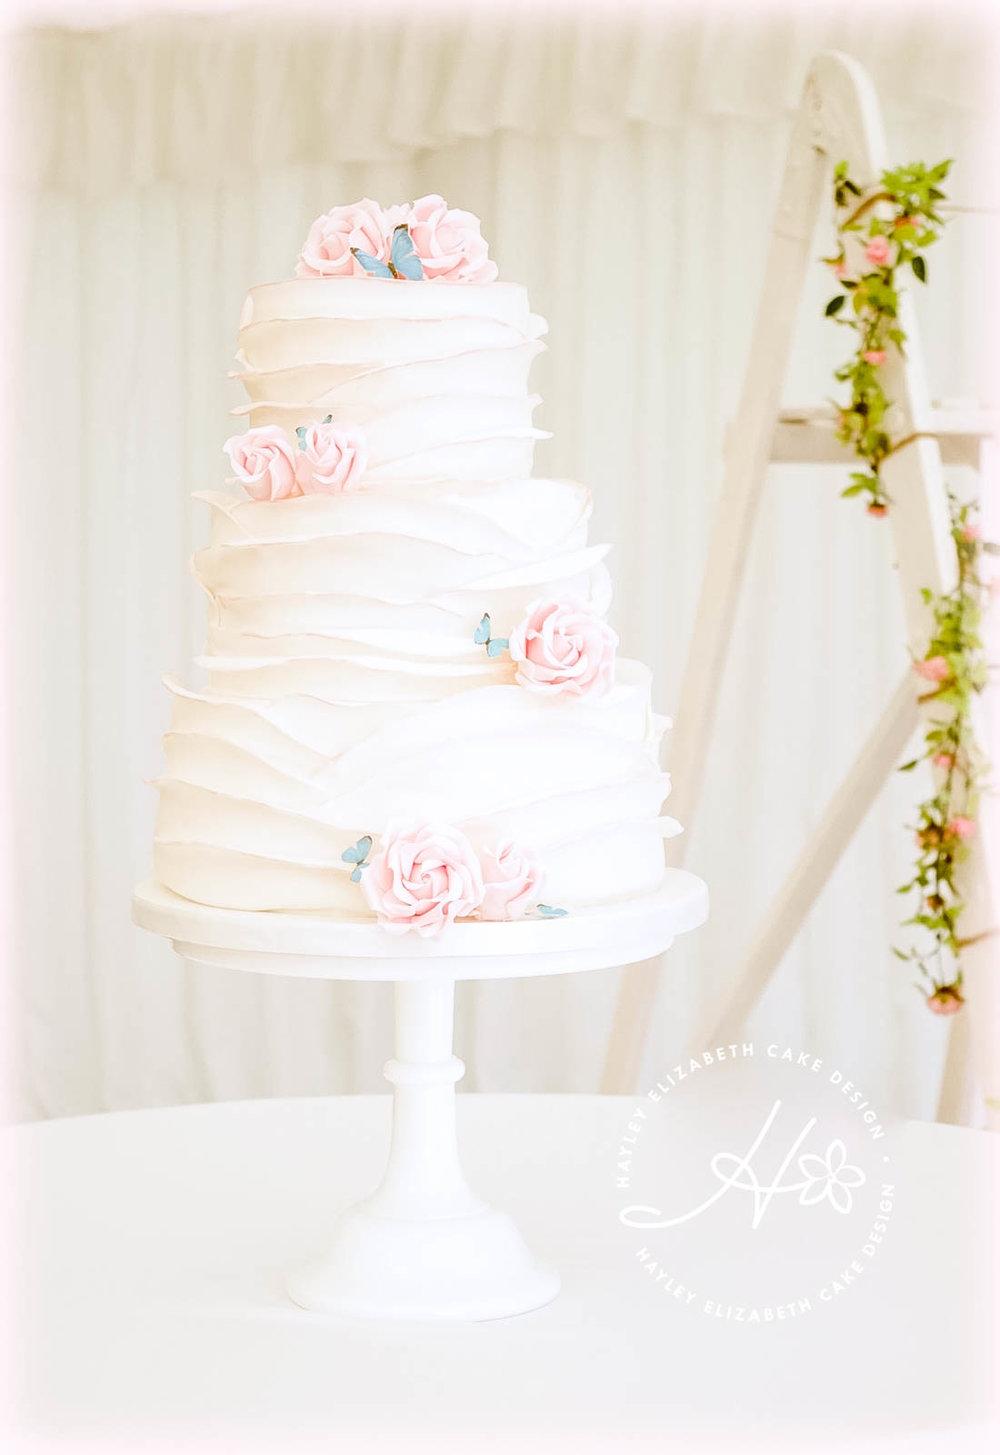 white-ruffle-wedding-cake-with-pink-painted-edge.jpg